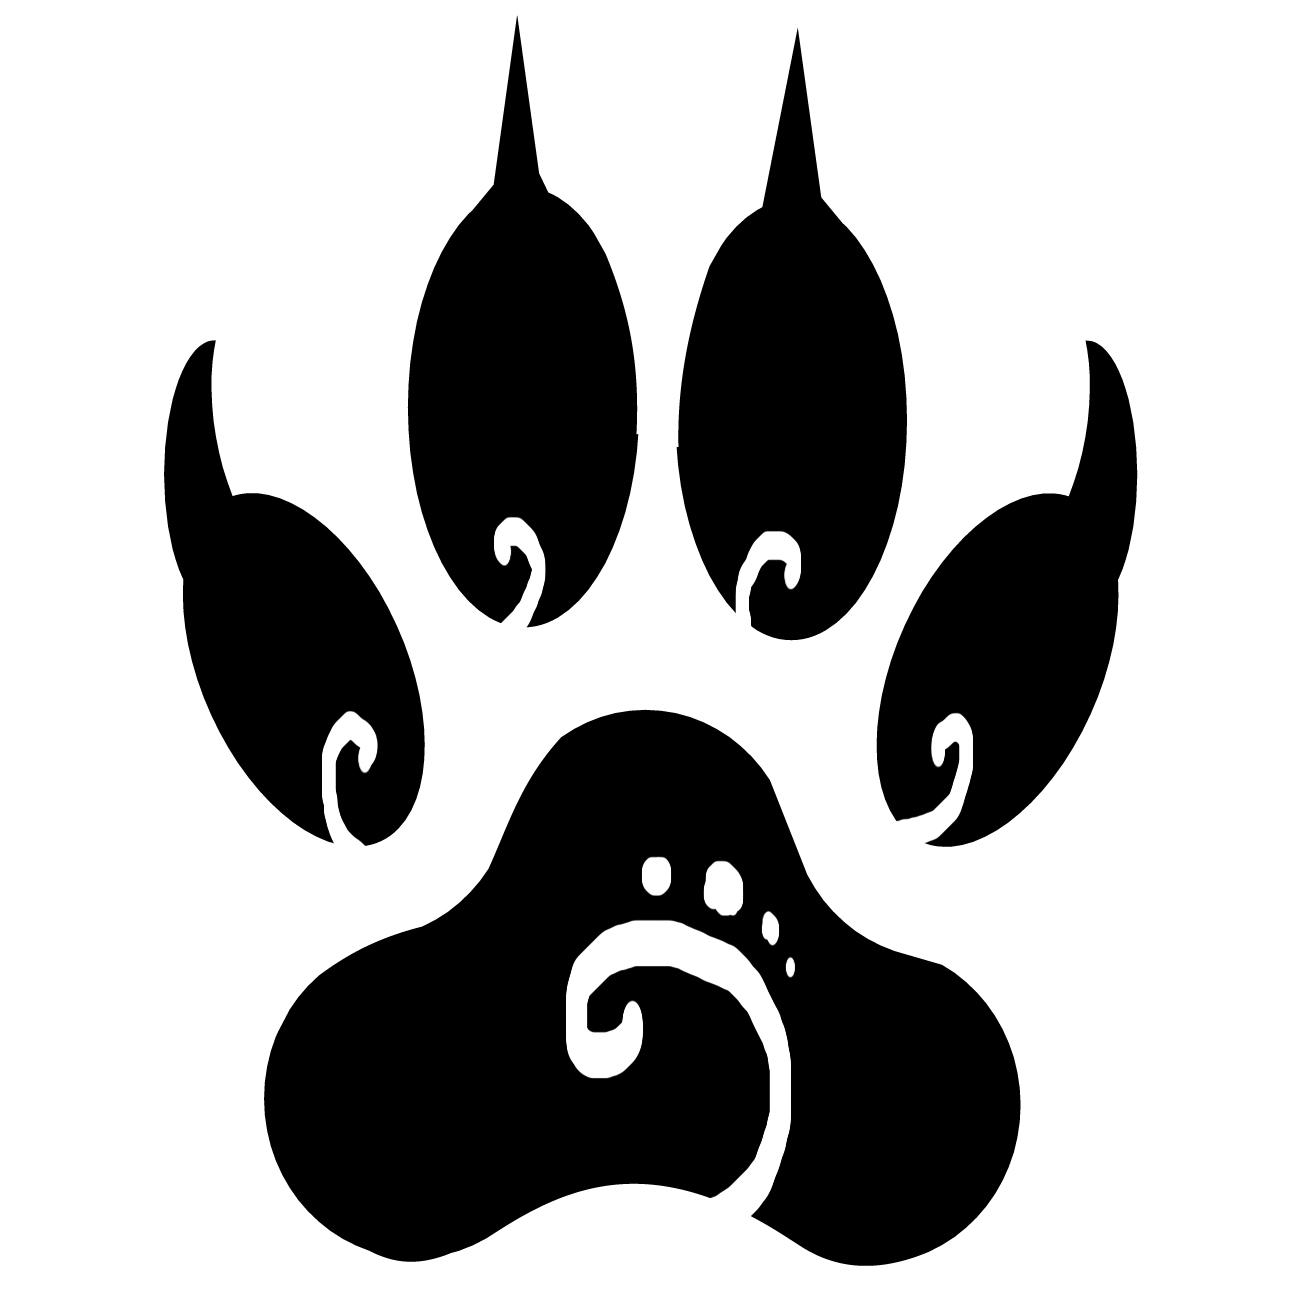 pawprintsymbol.jpg